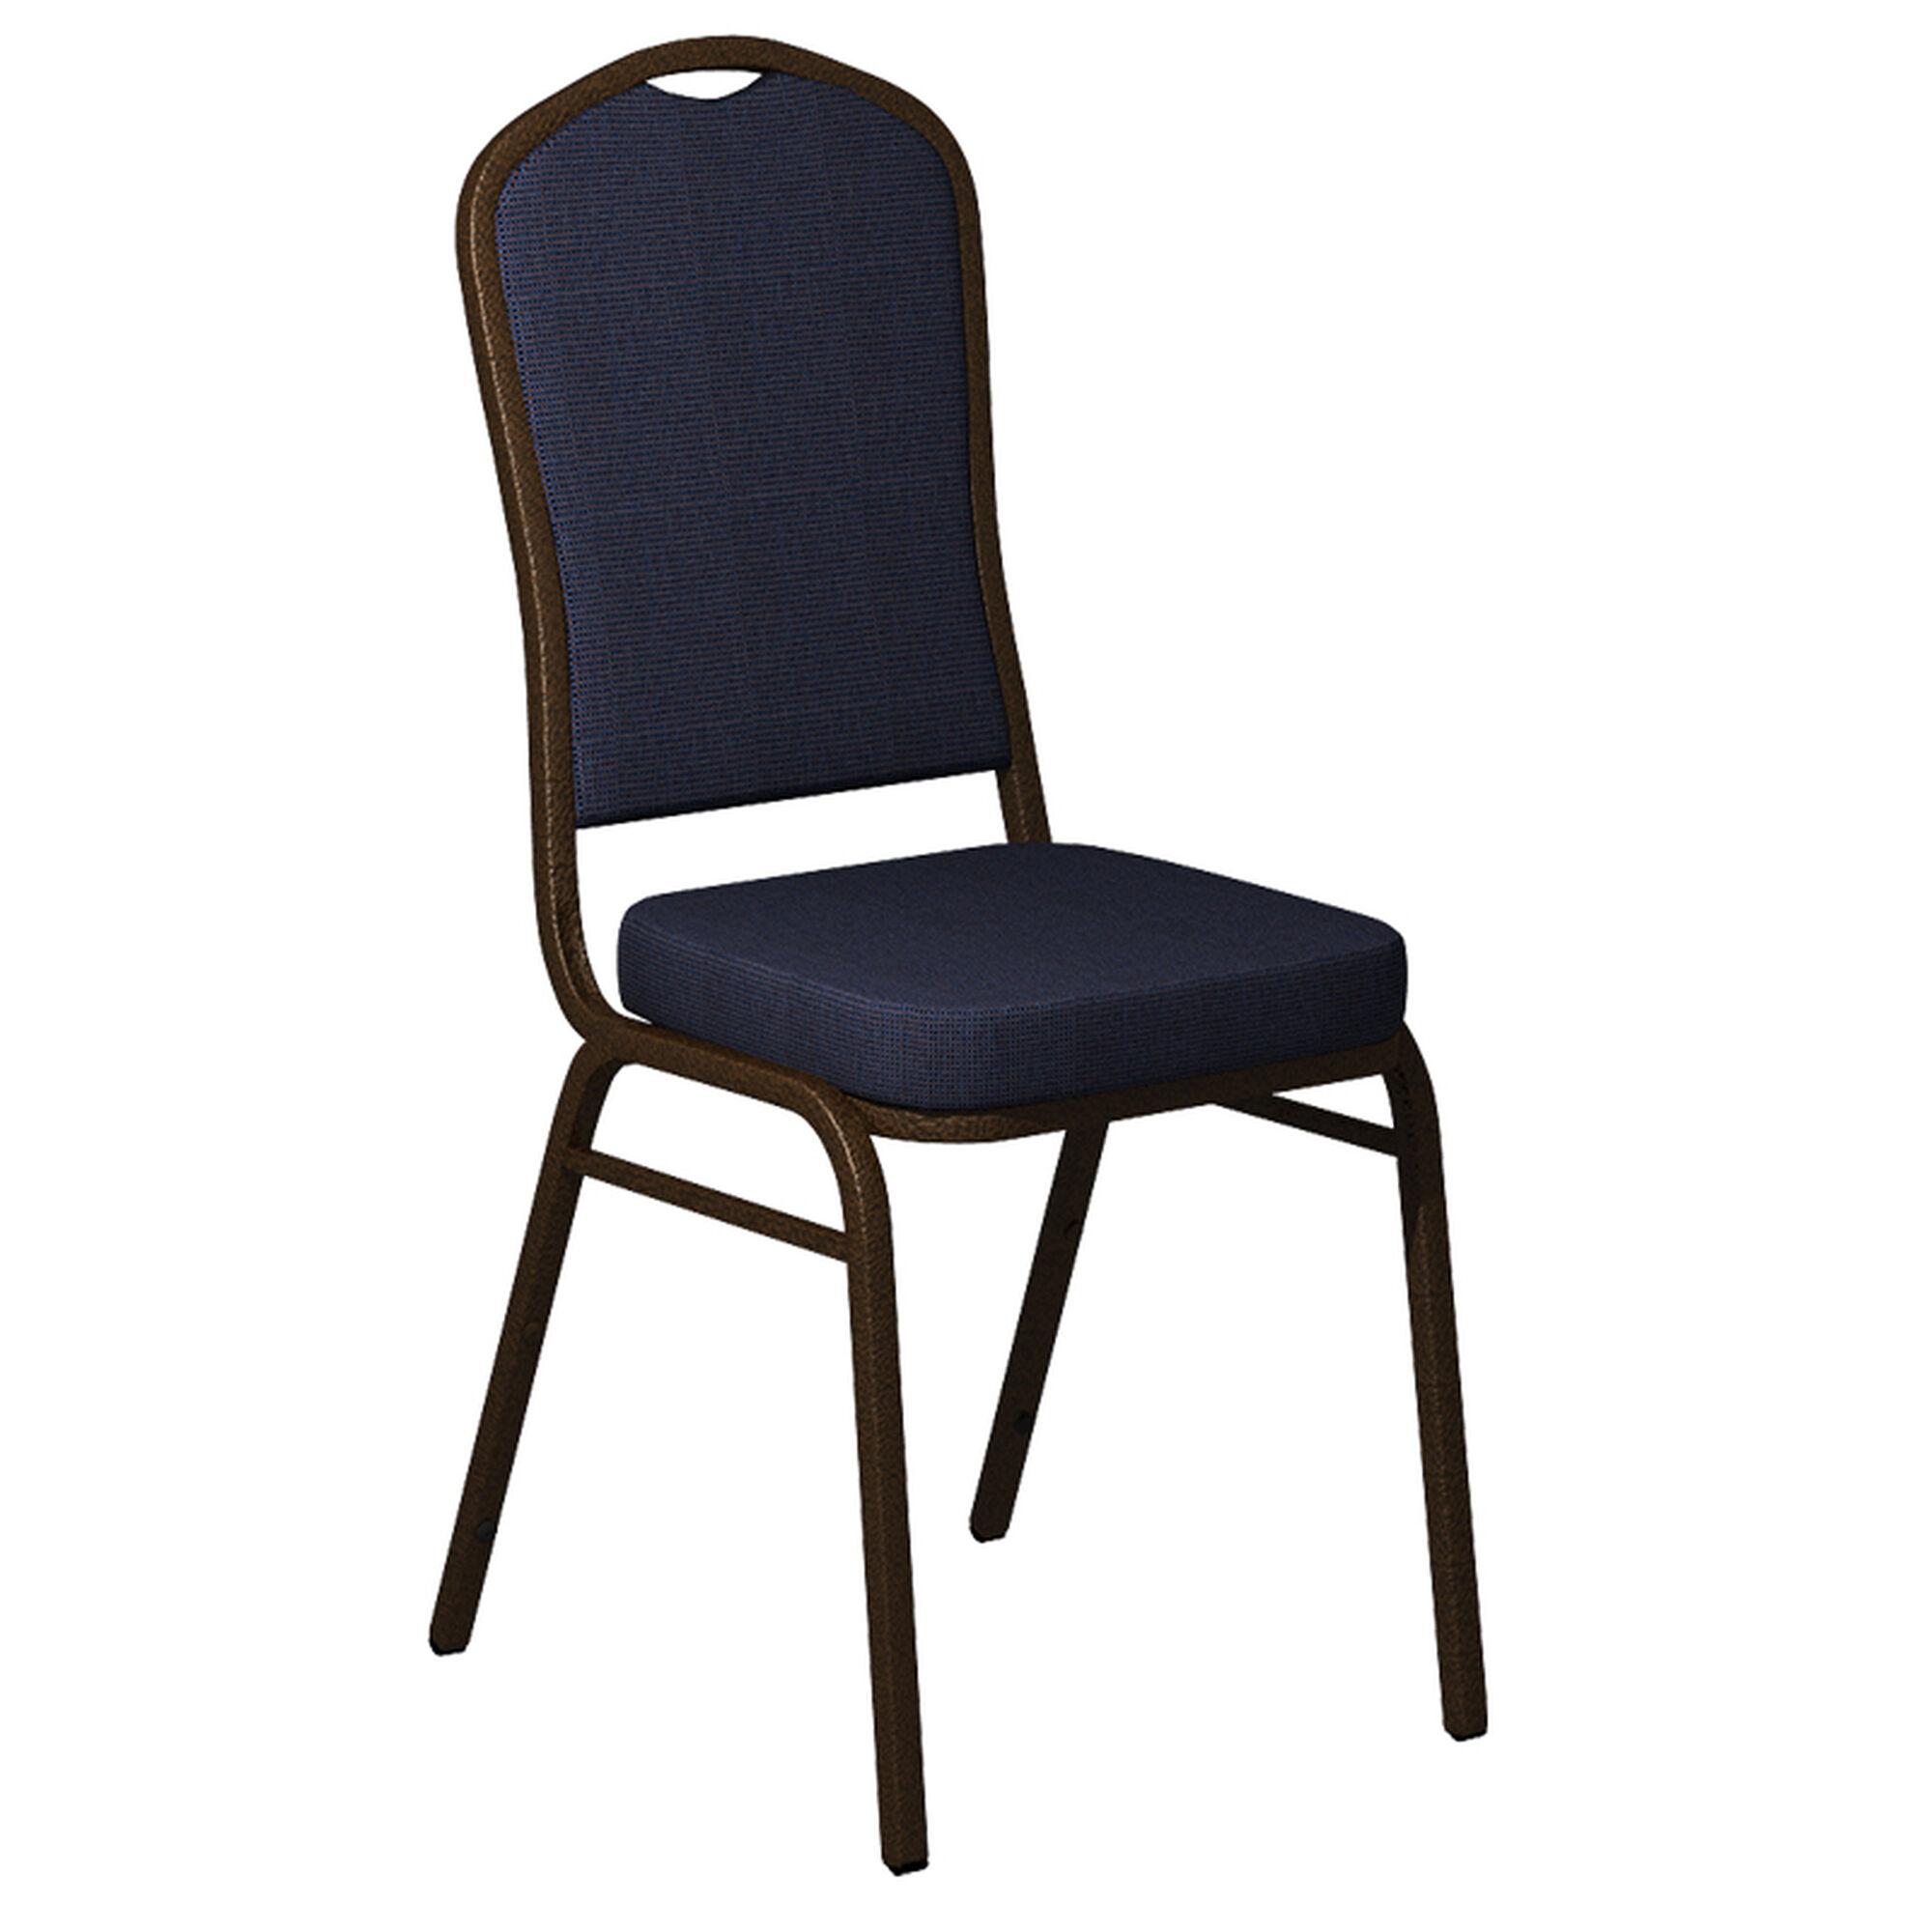 Crown Back Banquet Chair in Shire Titan Blue Fabric - Gold Vein Frame